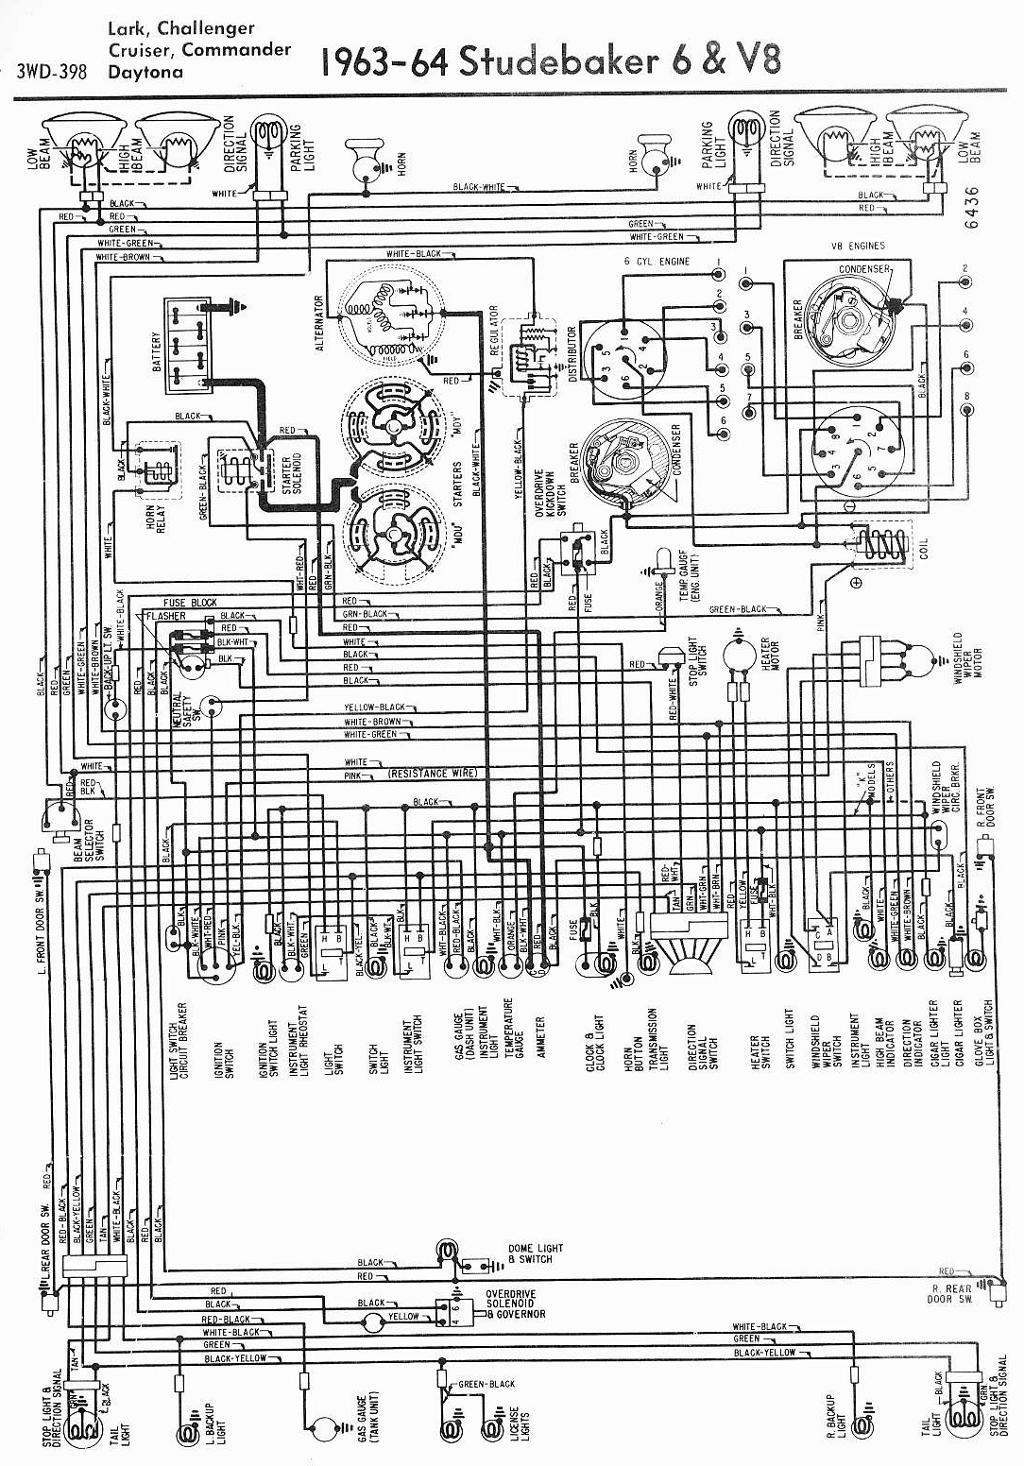 studebaker car manuals wiring diagrams pdf fault codes rh automotive manuals net Ferrari Dino Ferrari Daytona Convertible